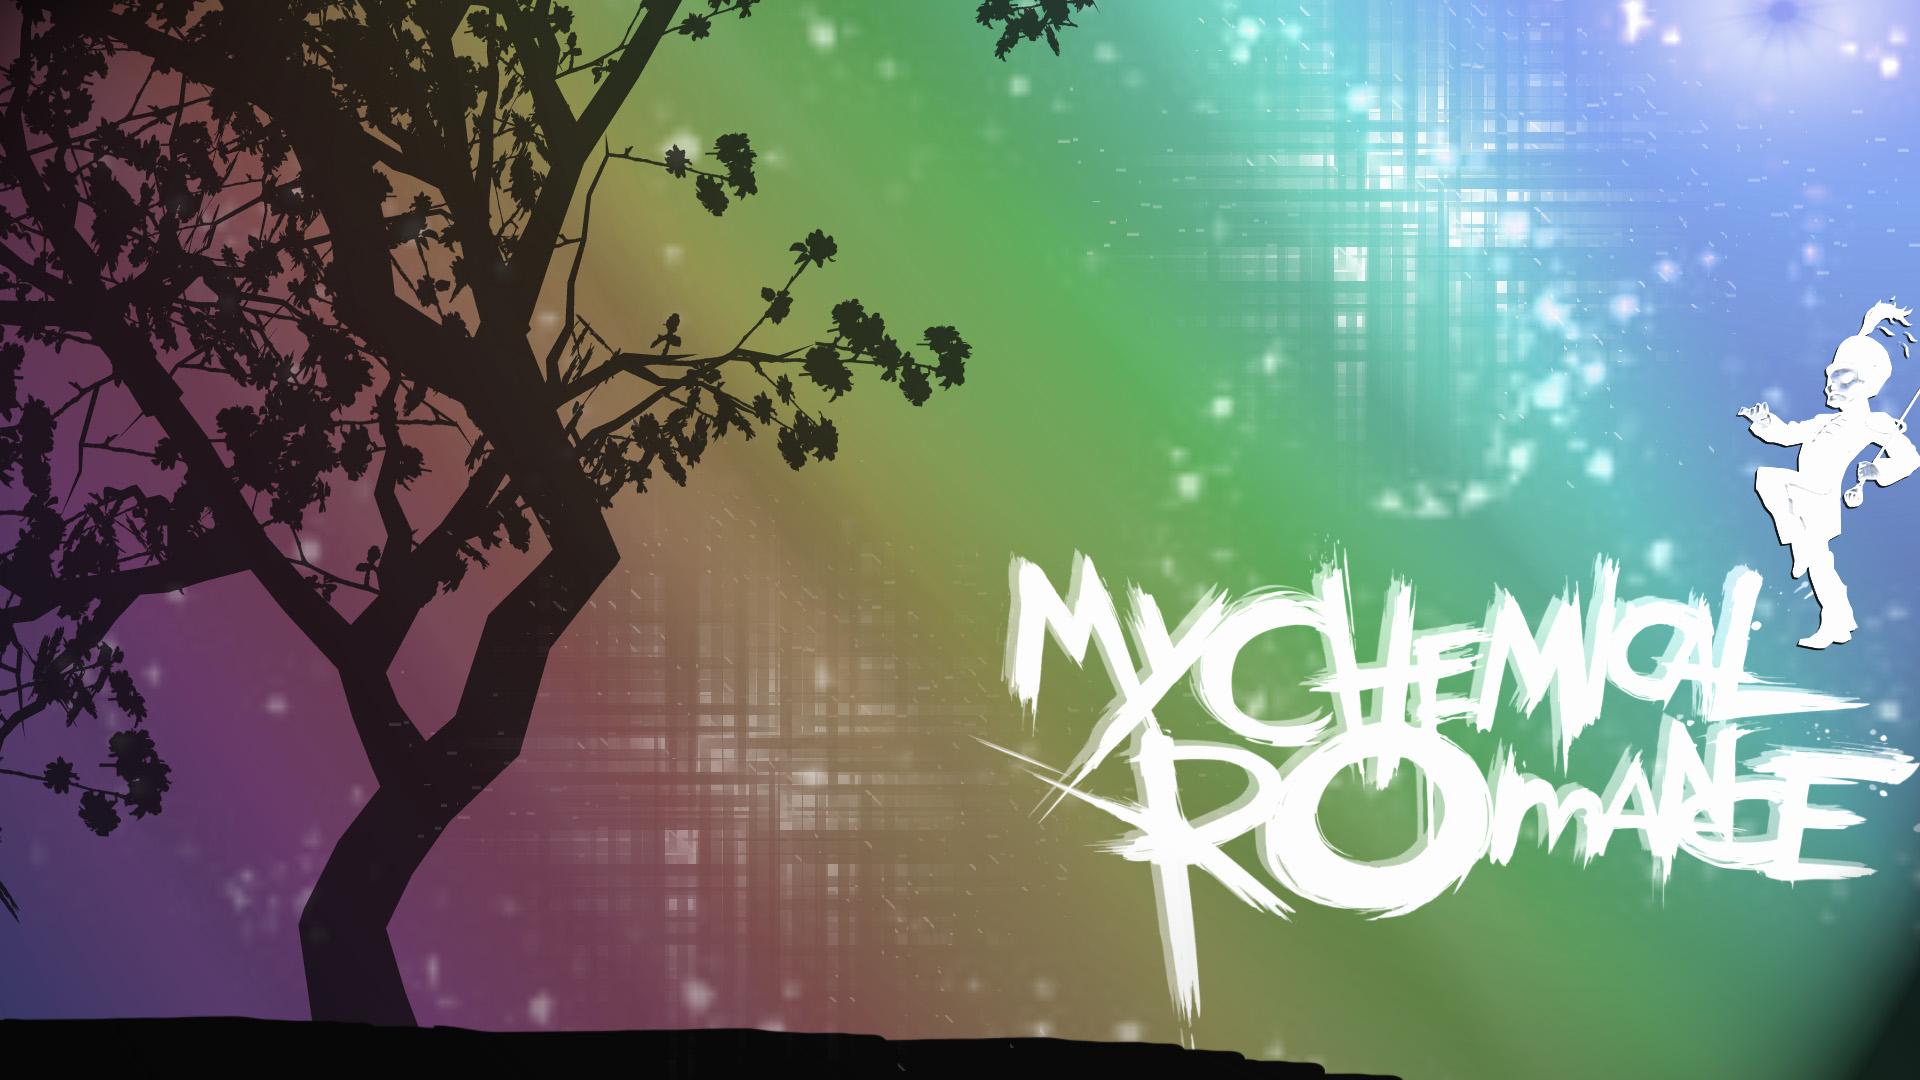 Fall Romance Wallpaper Hd My Chemical Romance Wallpapers Pixelstalk Net